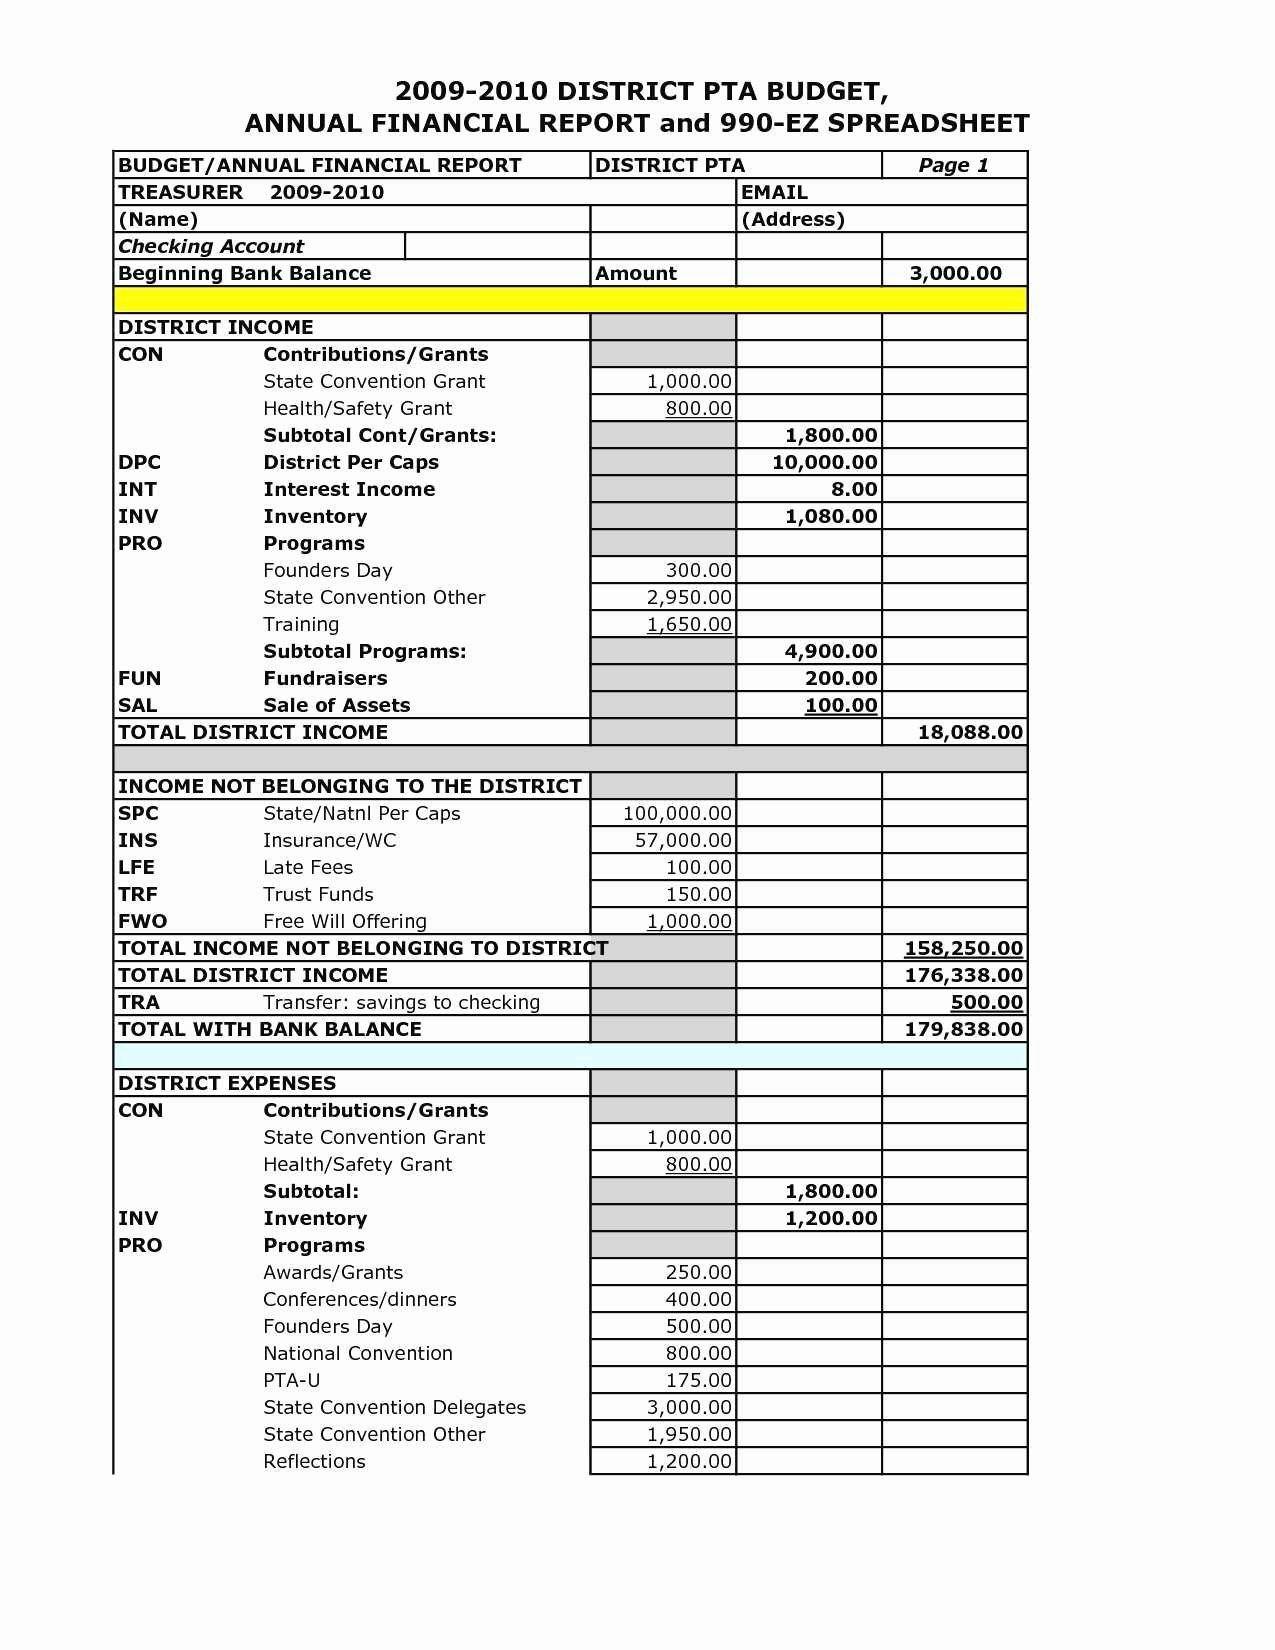 Treasurer Report Template Non Profit Unique Beautiful Treasurer Report Template for Non Profit